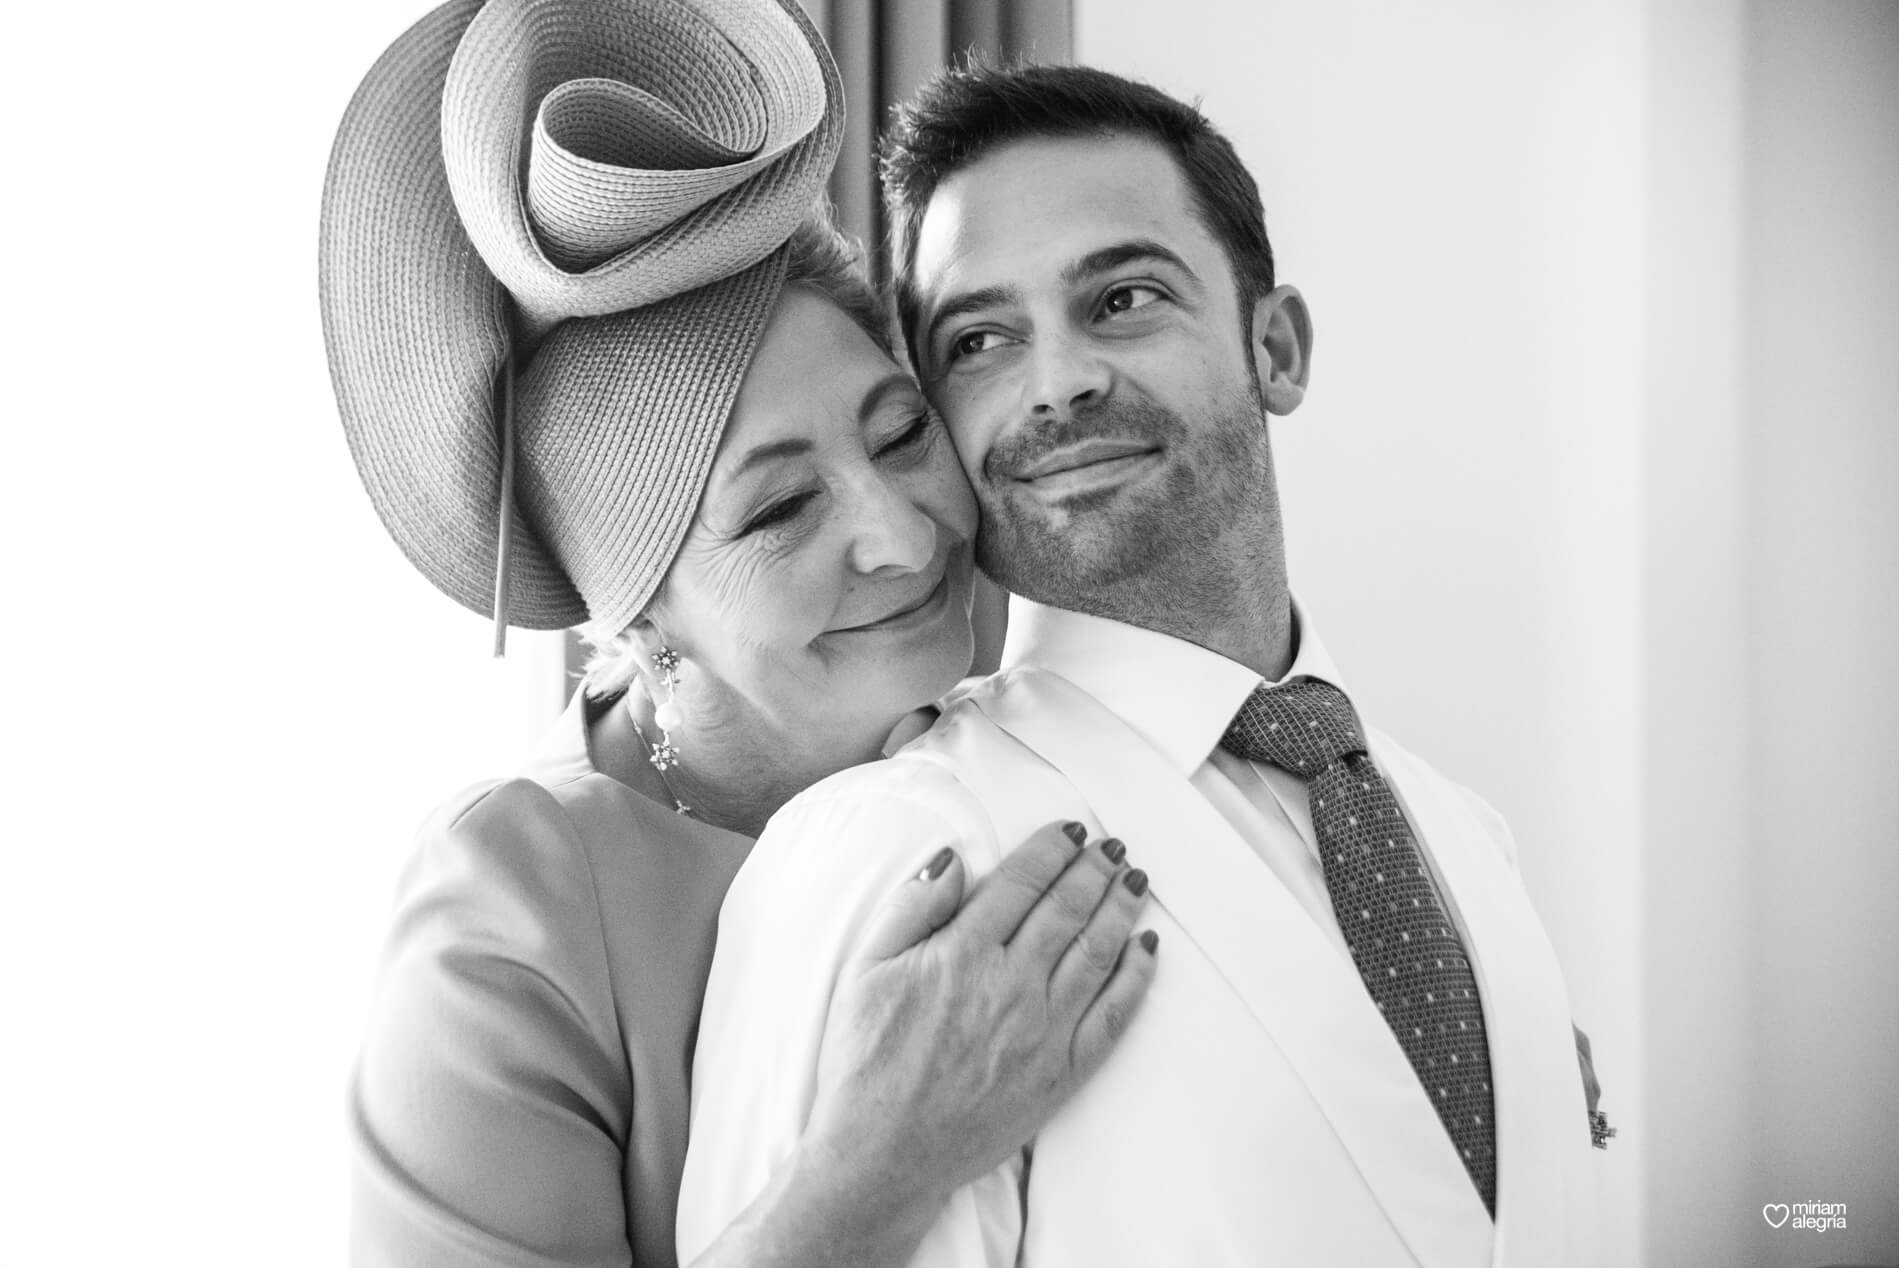 vestido-de-novia-paula-del-vas-miriam-alegria-fotografos-boda-murcia-173